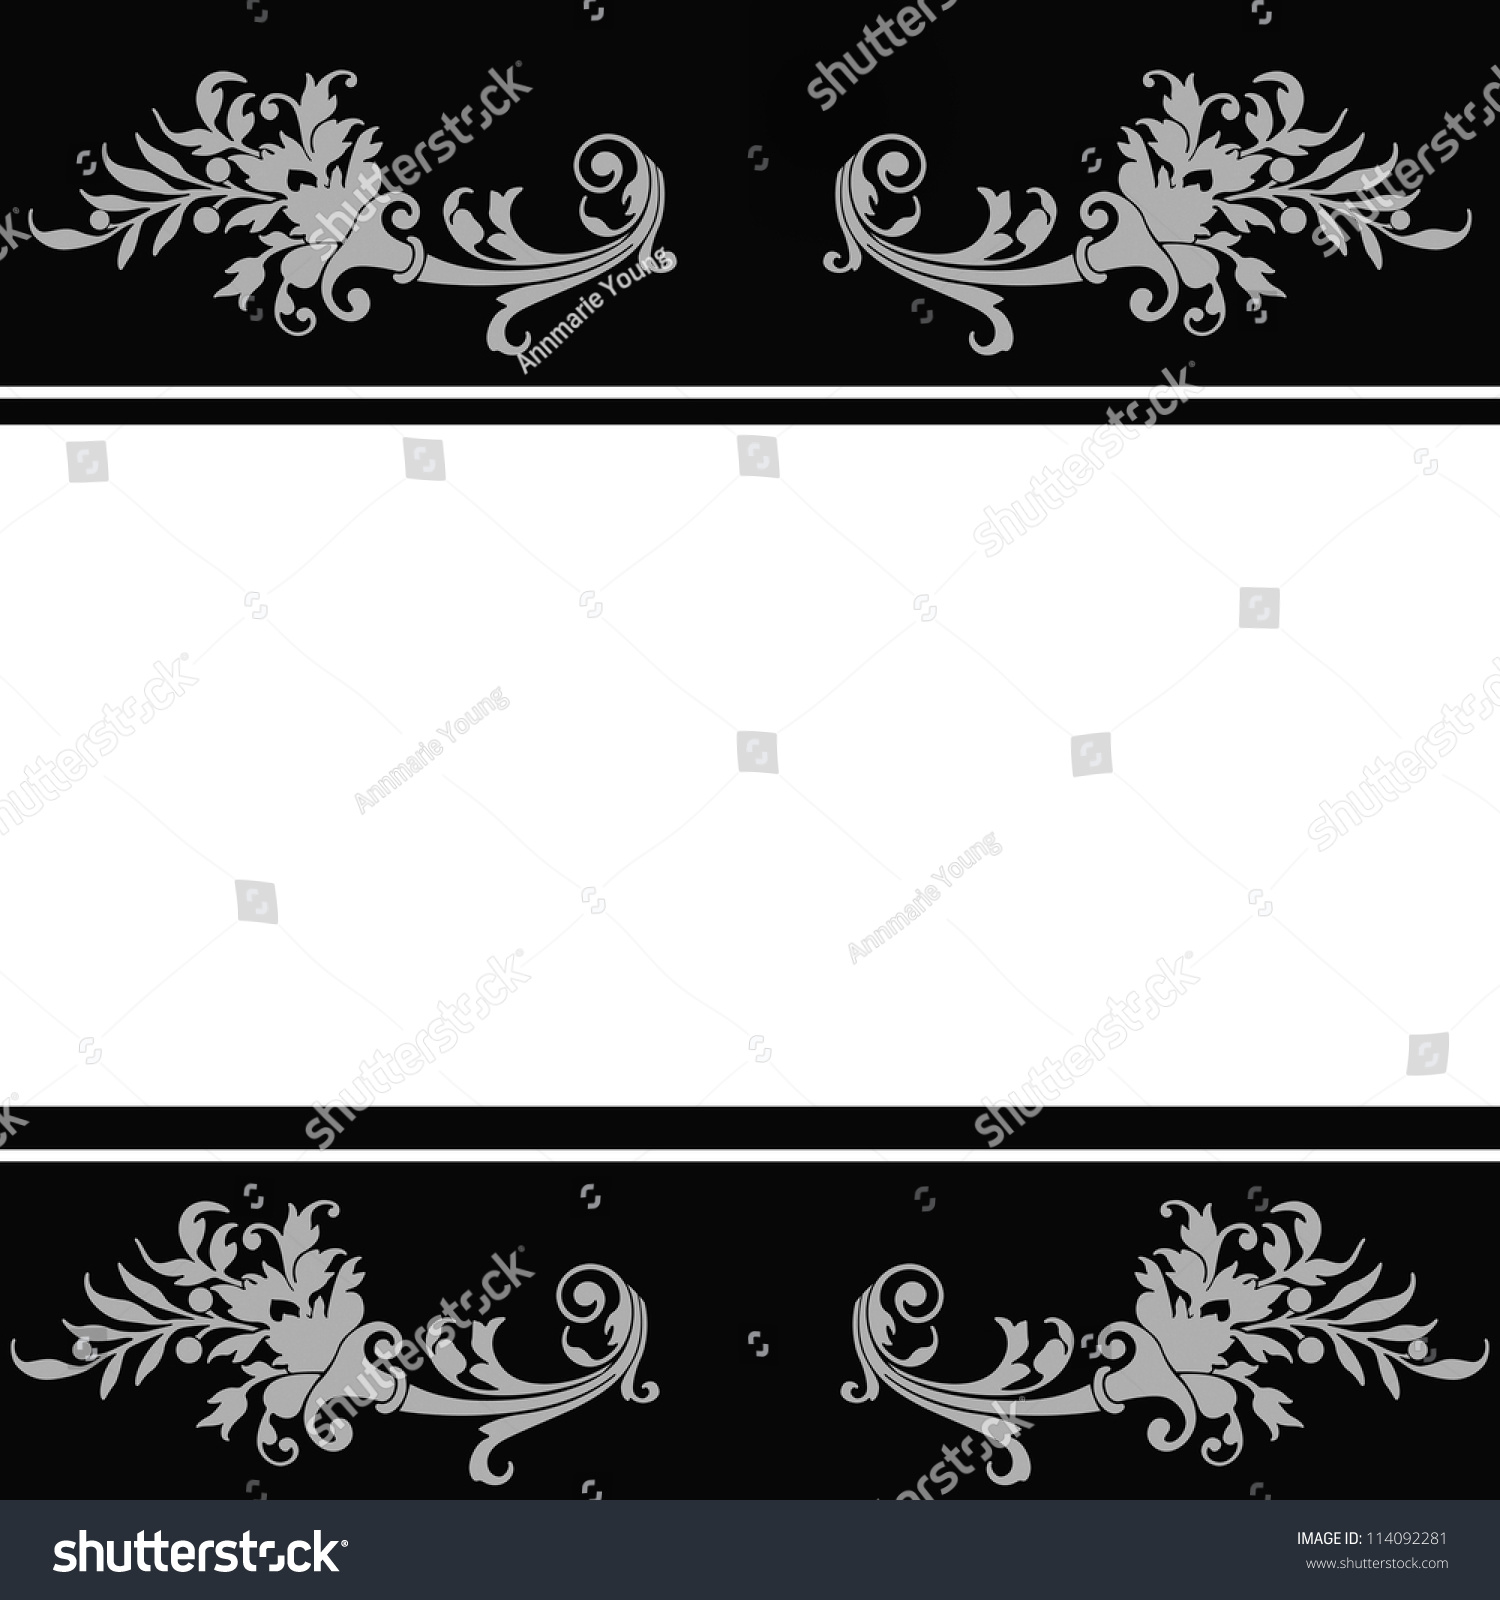 Floral Wedding Invitation Background Black White Stockillustration